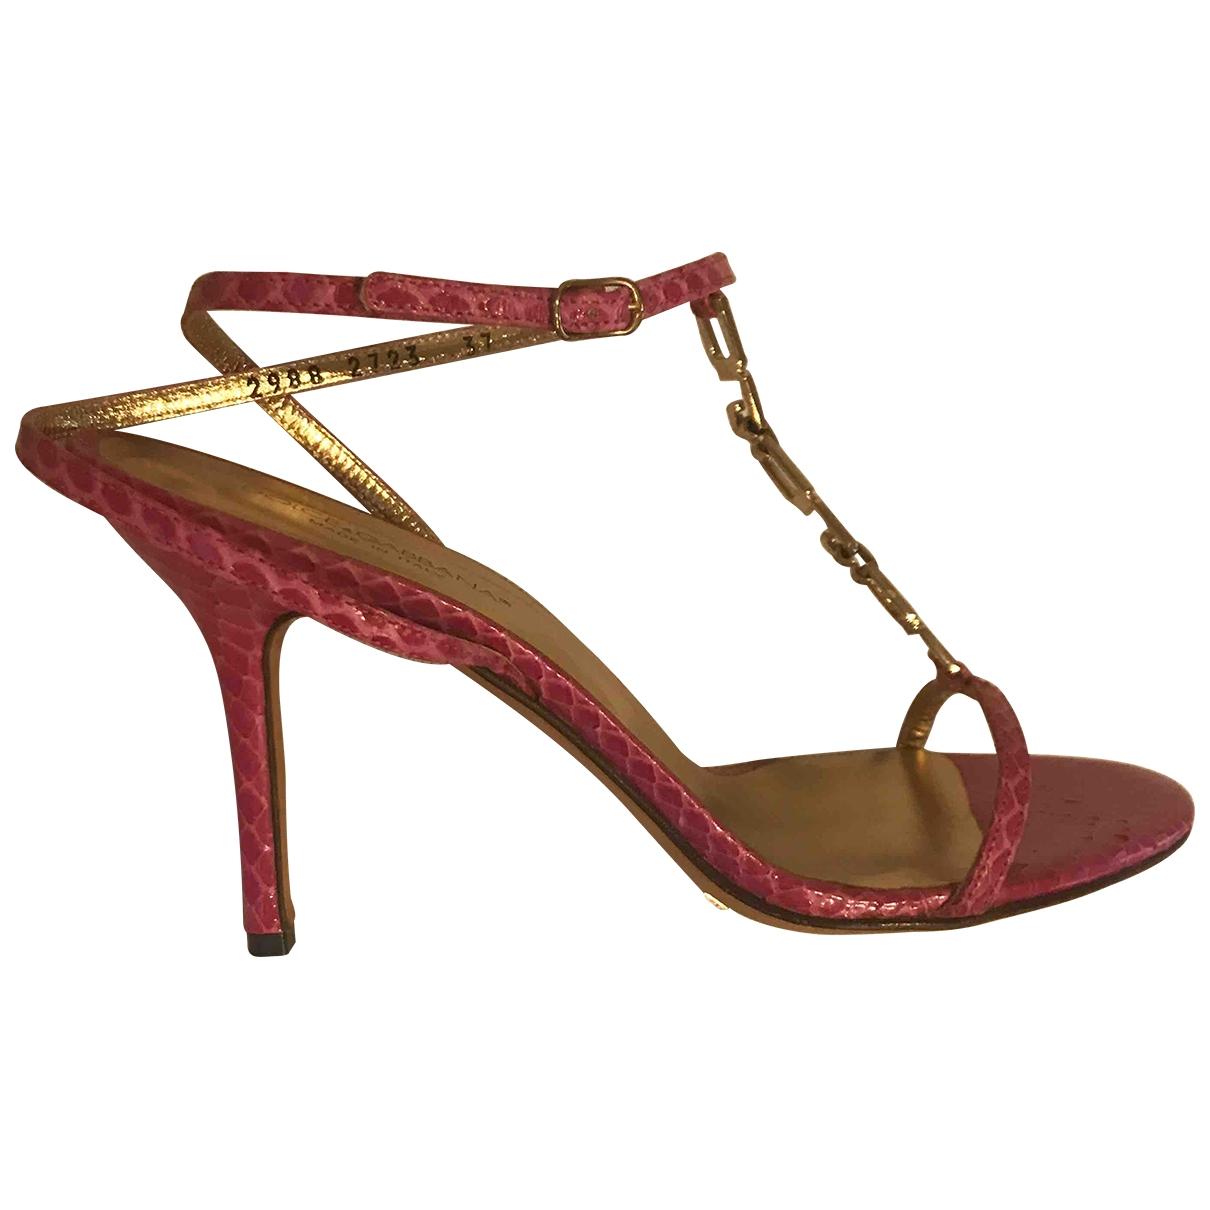 Dolce & Gabbana \N Pink Python Sandals for Women 37 IT